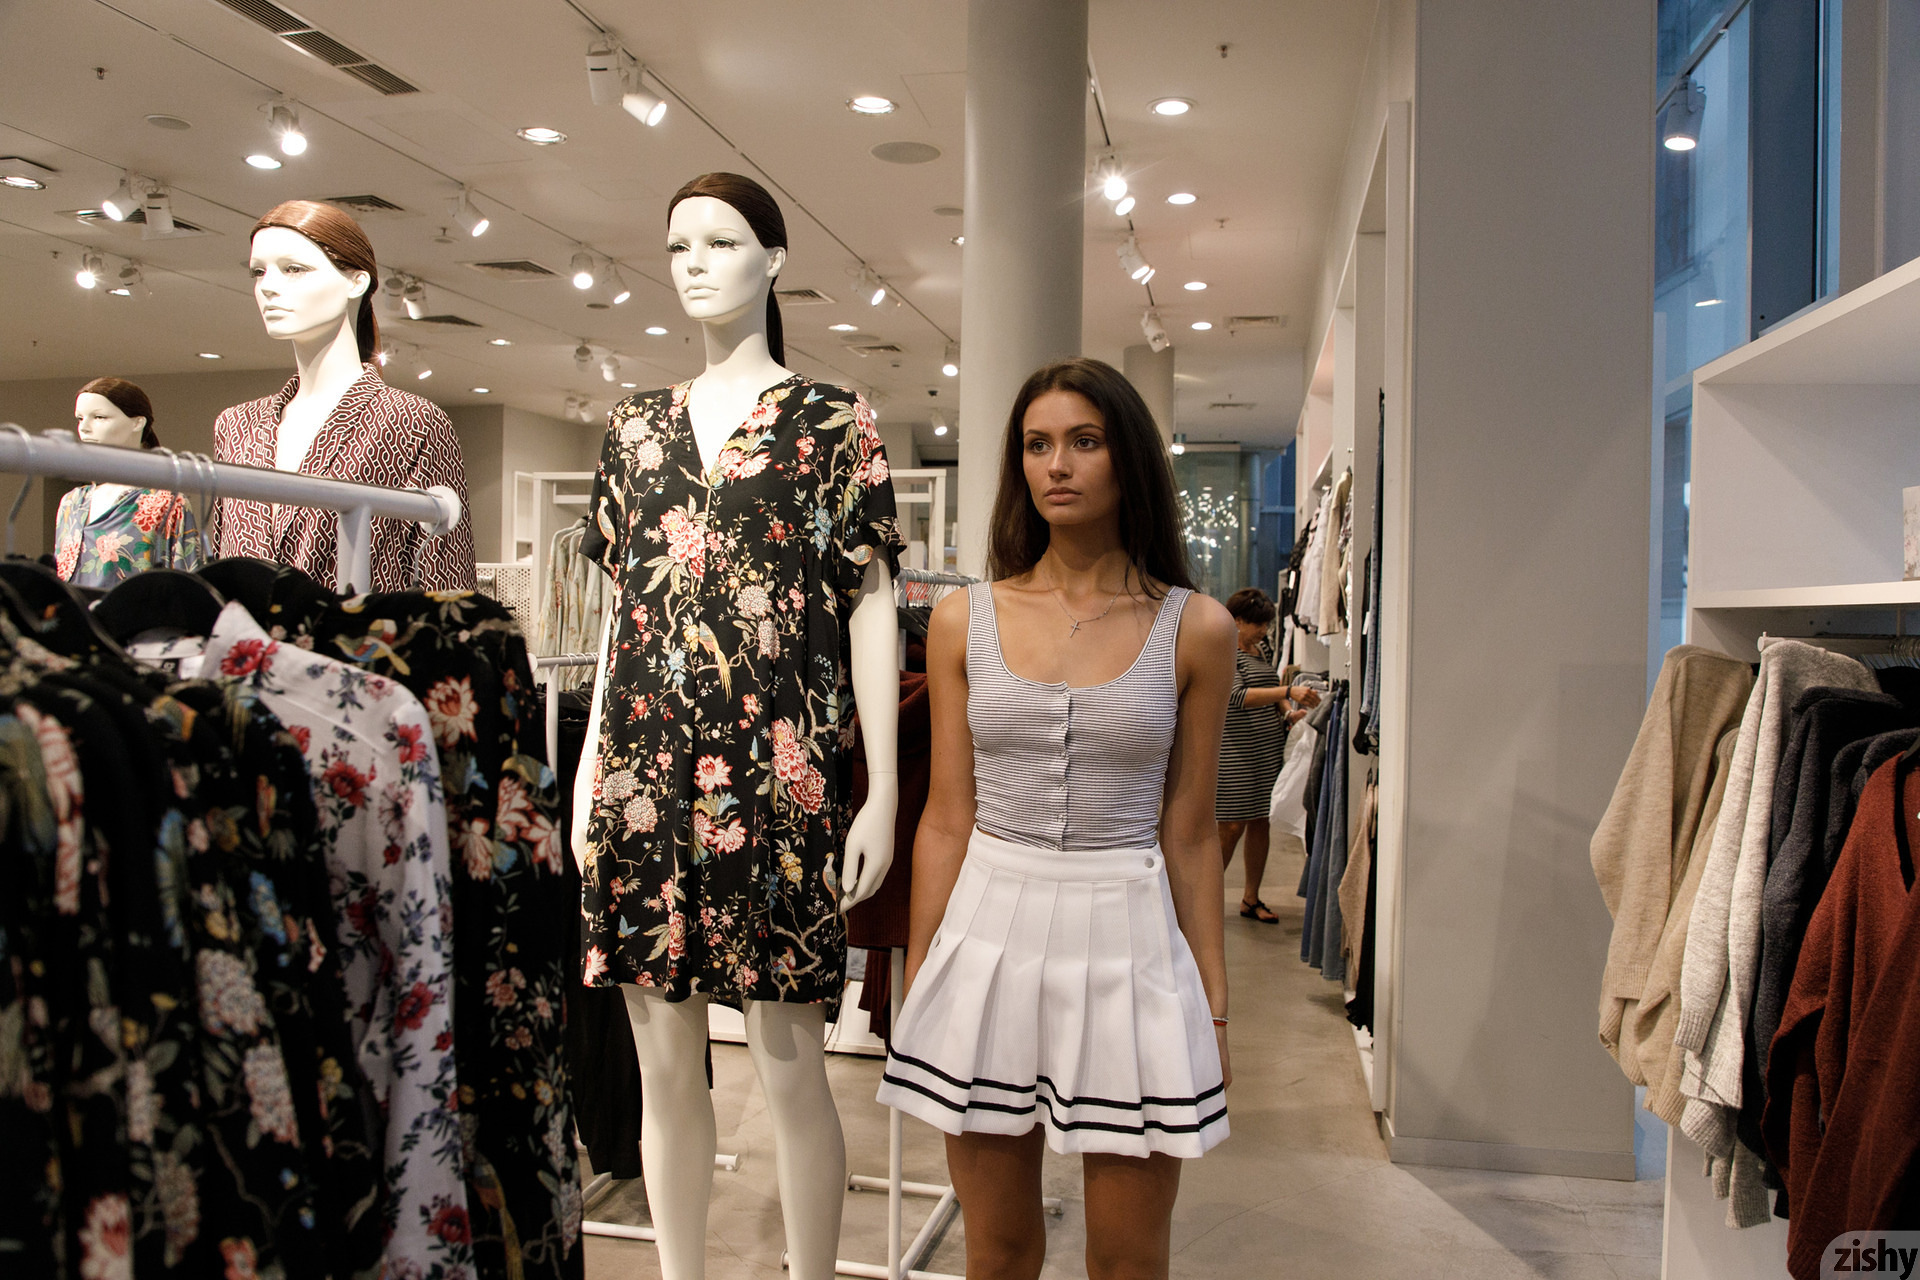 Shyla Volbeck Shopping With The Devil Zishy (16)